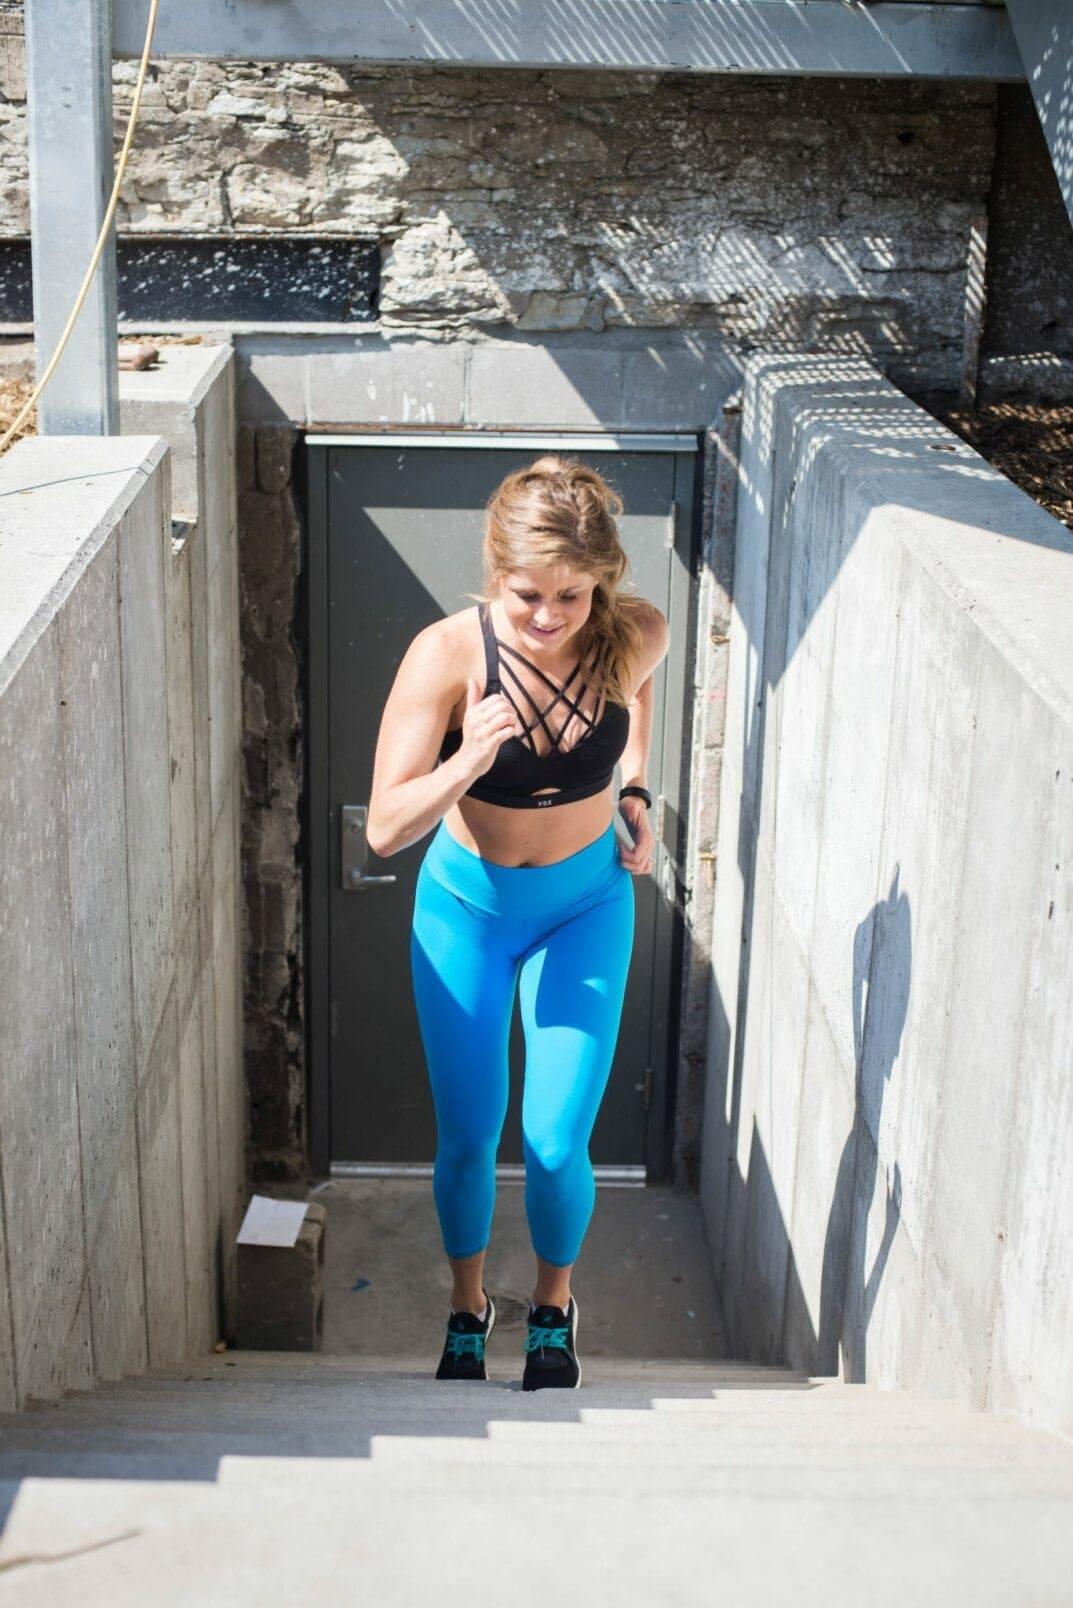 stair-climbing cardio workout | stair workout | outdoor workout | Butt workout | lower body workout